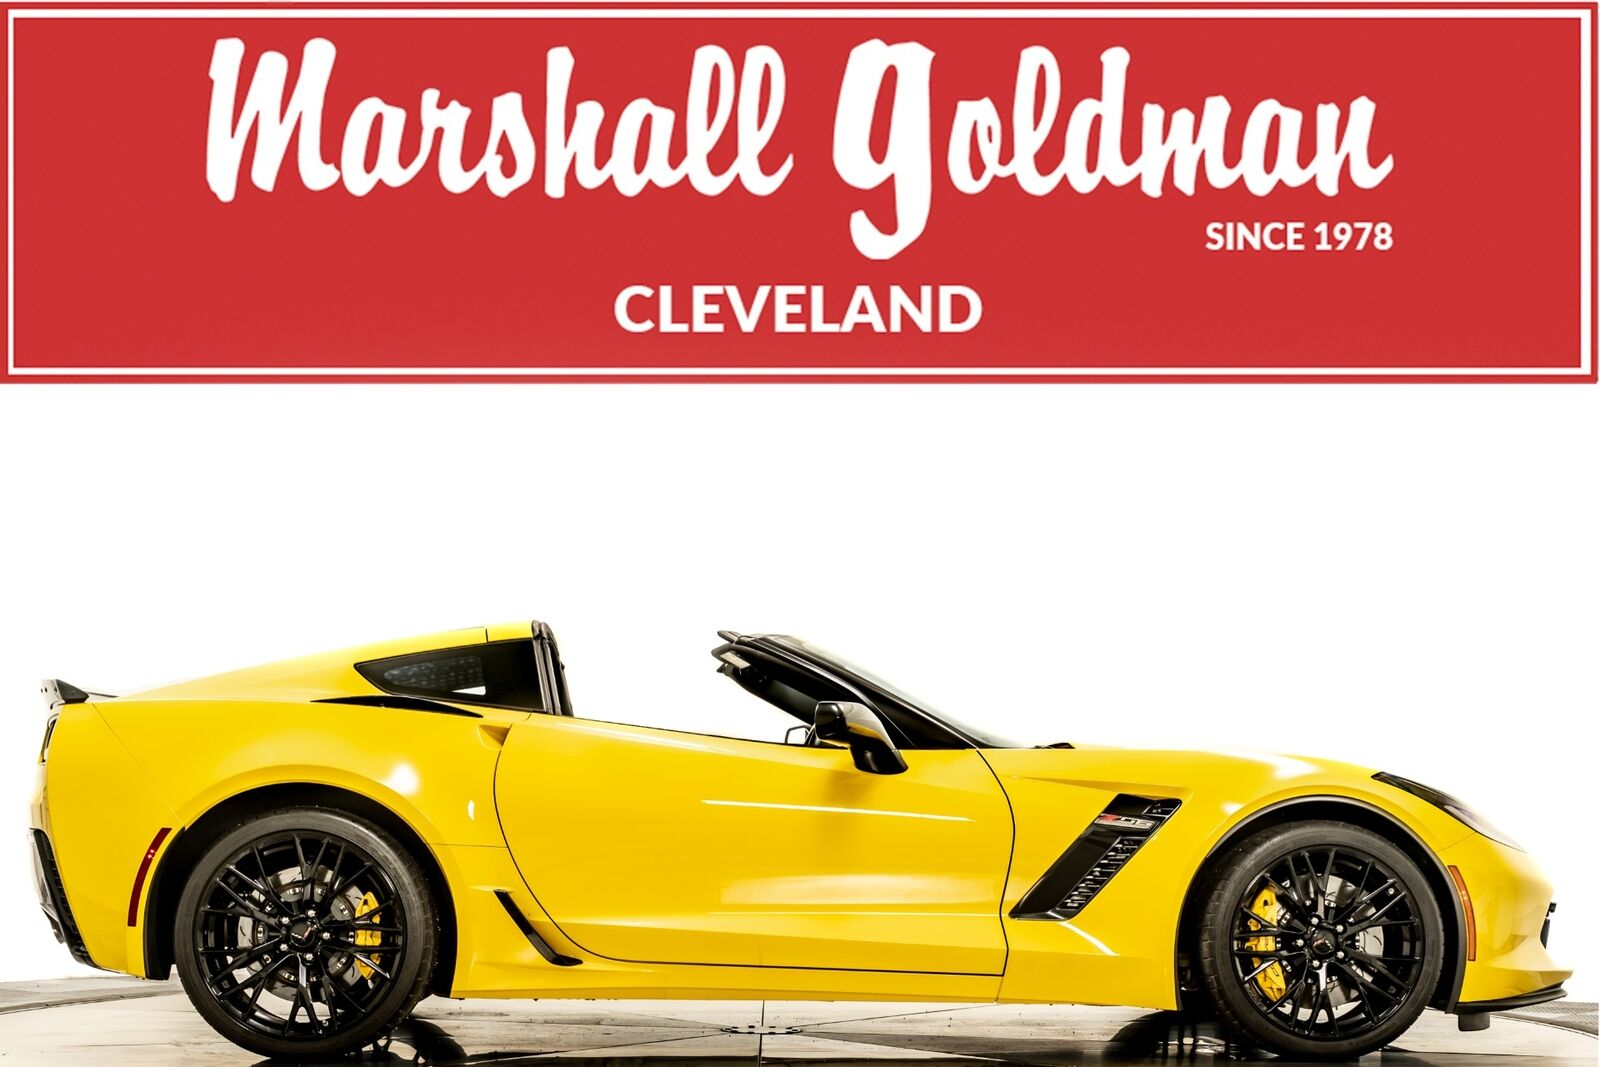 2016 Yellow Chevrolet Corvette Z06  | C7 Corvette Photo 1